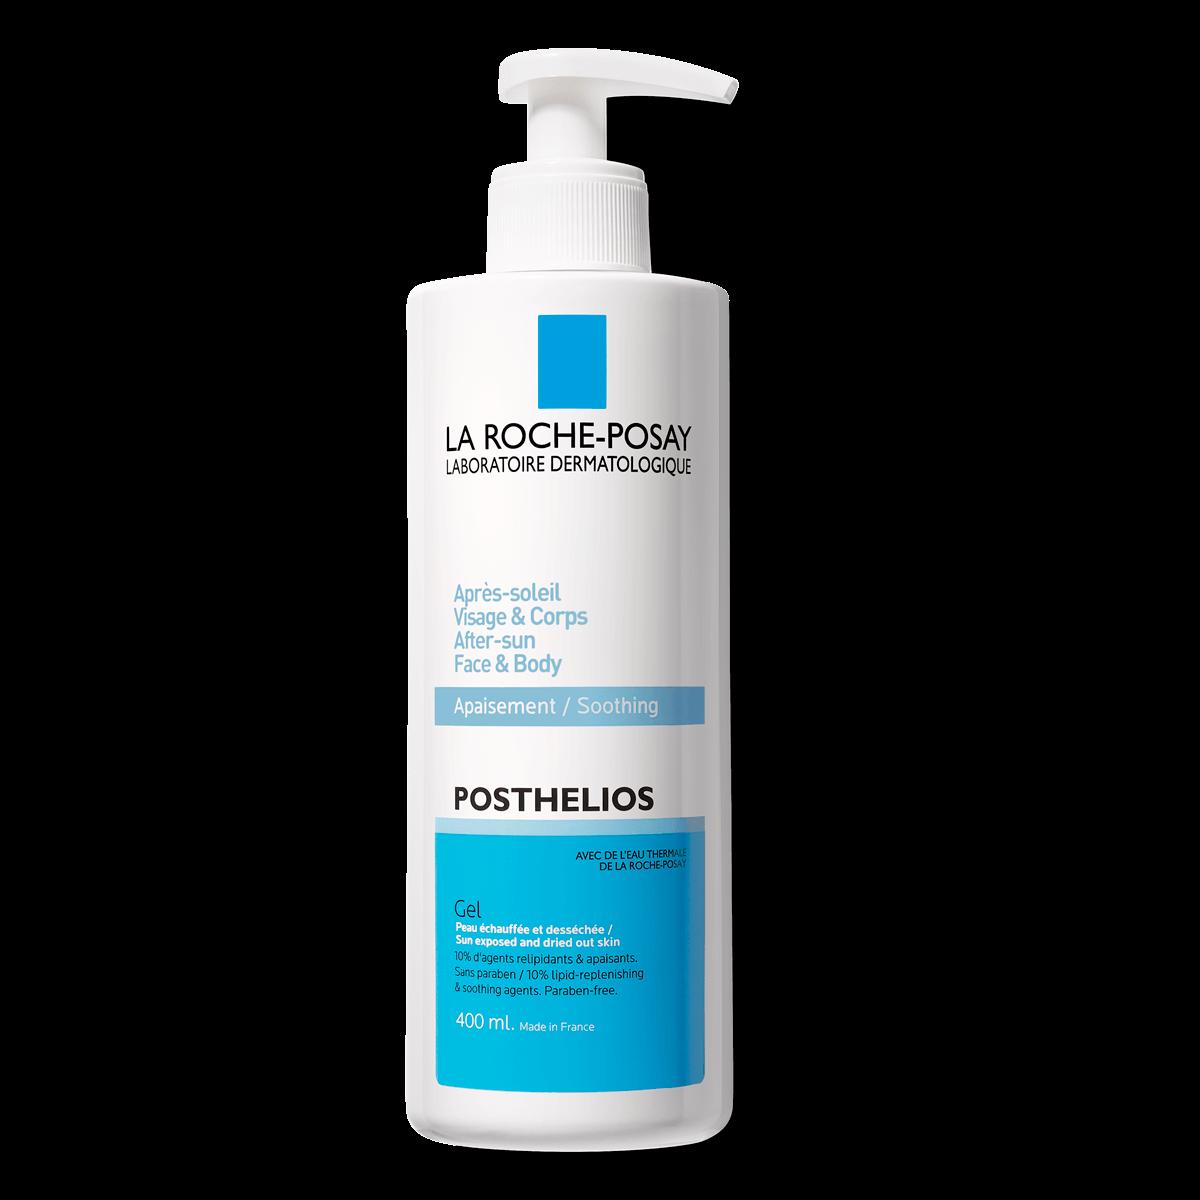 La Roche Posay Efter Sol Posthelios flydende gel 400ml 3337872413513 Fr